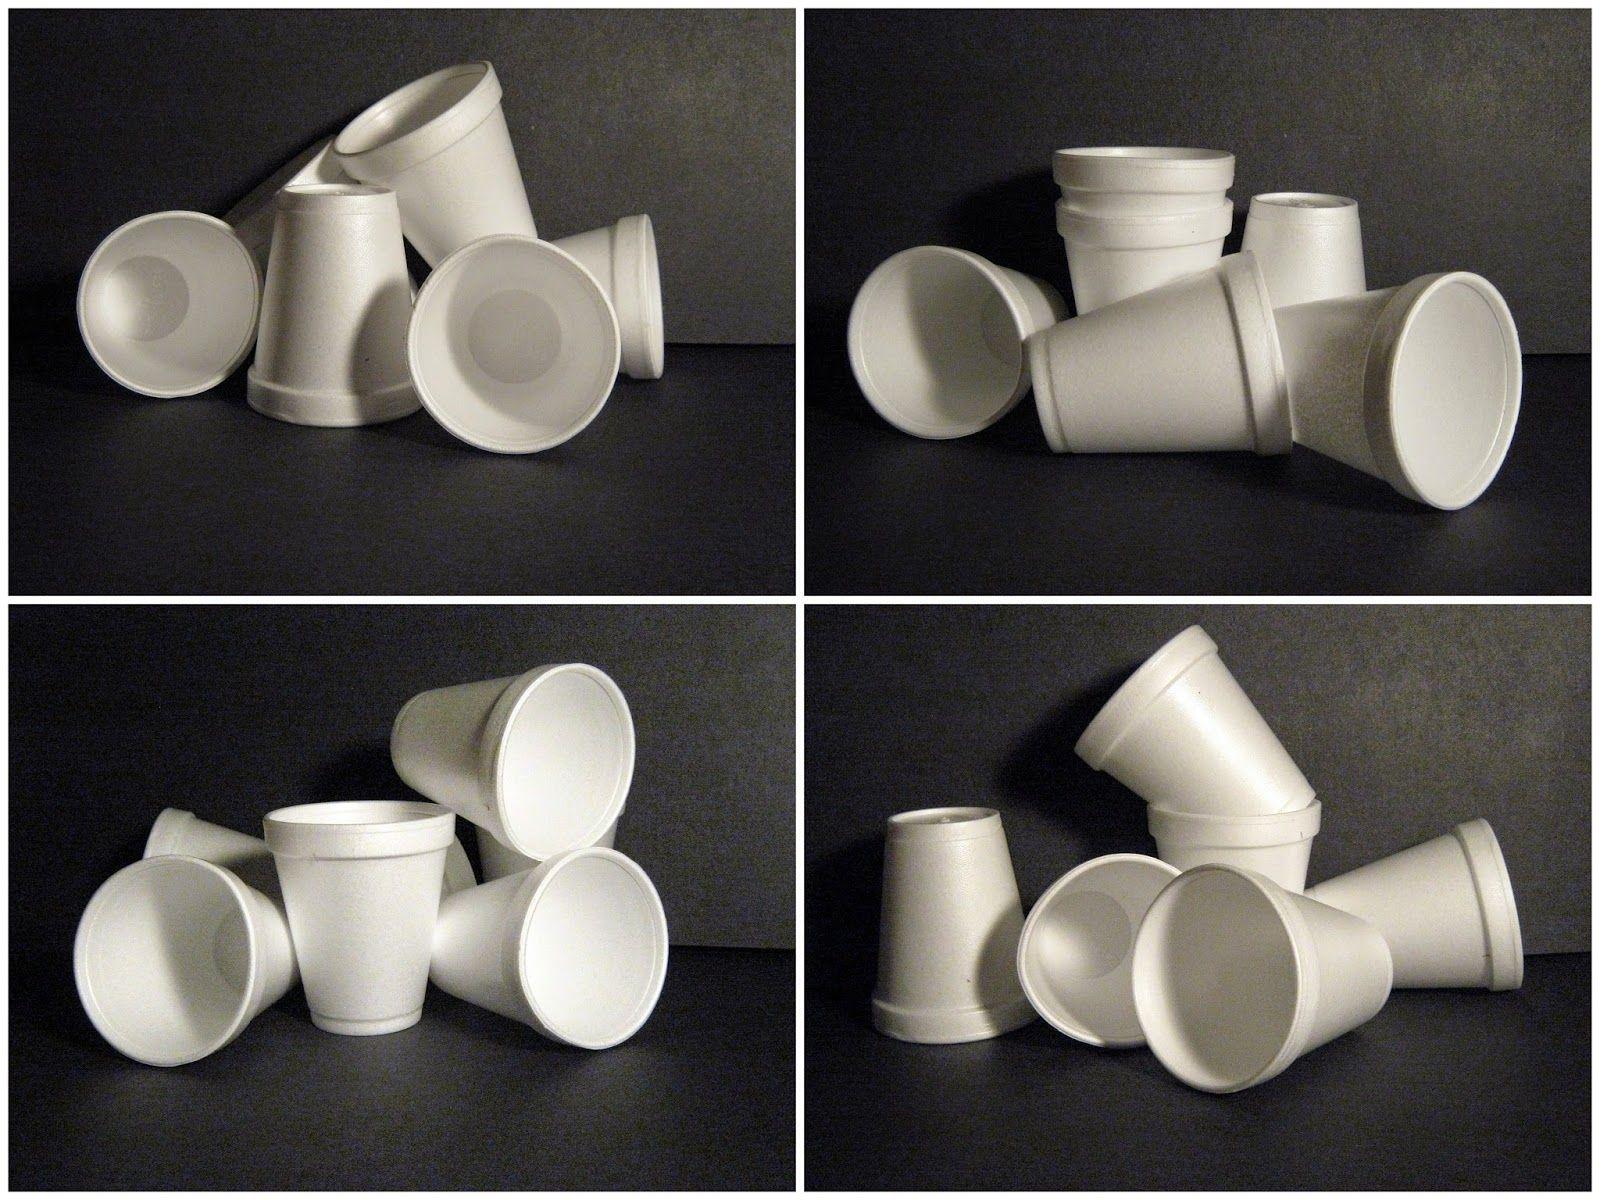 Not So Plain White Cups